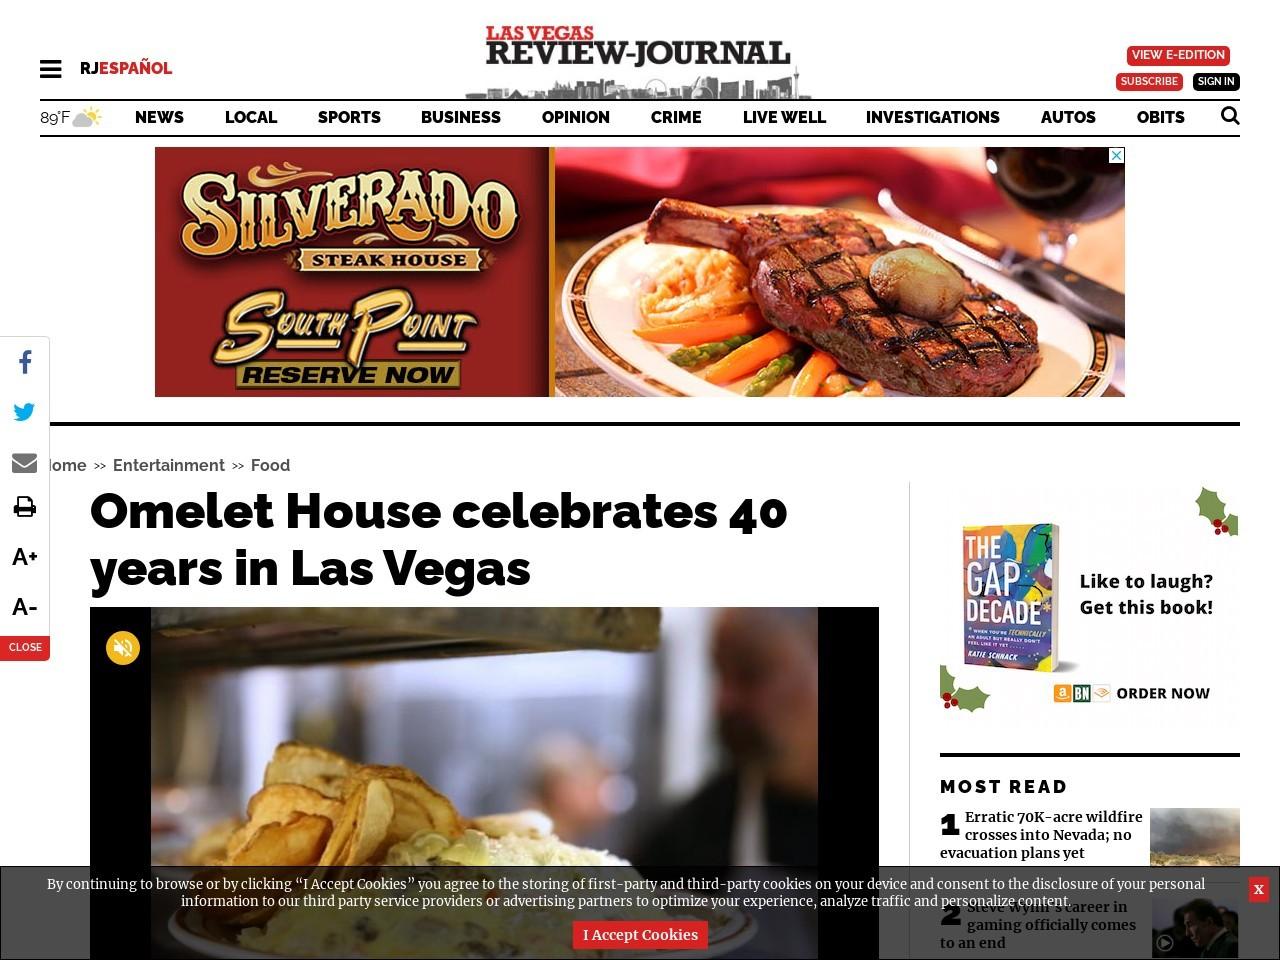 Omelet House celebrates 40 years in Las Vegas